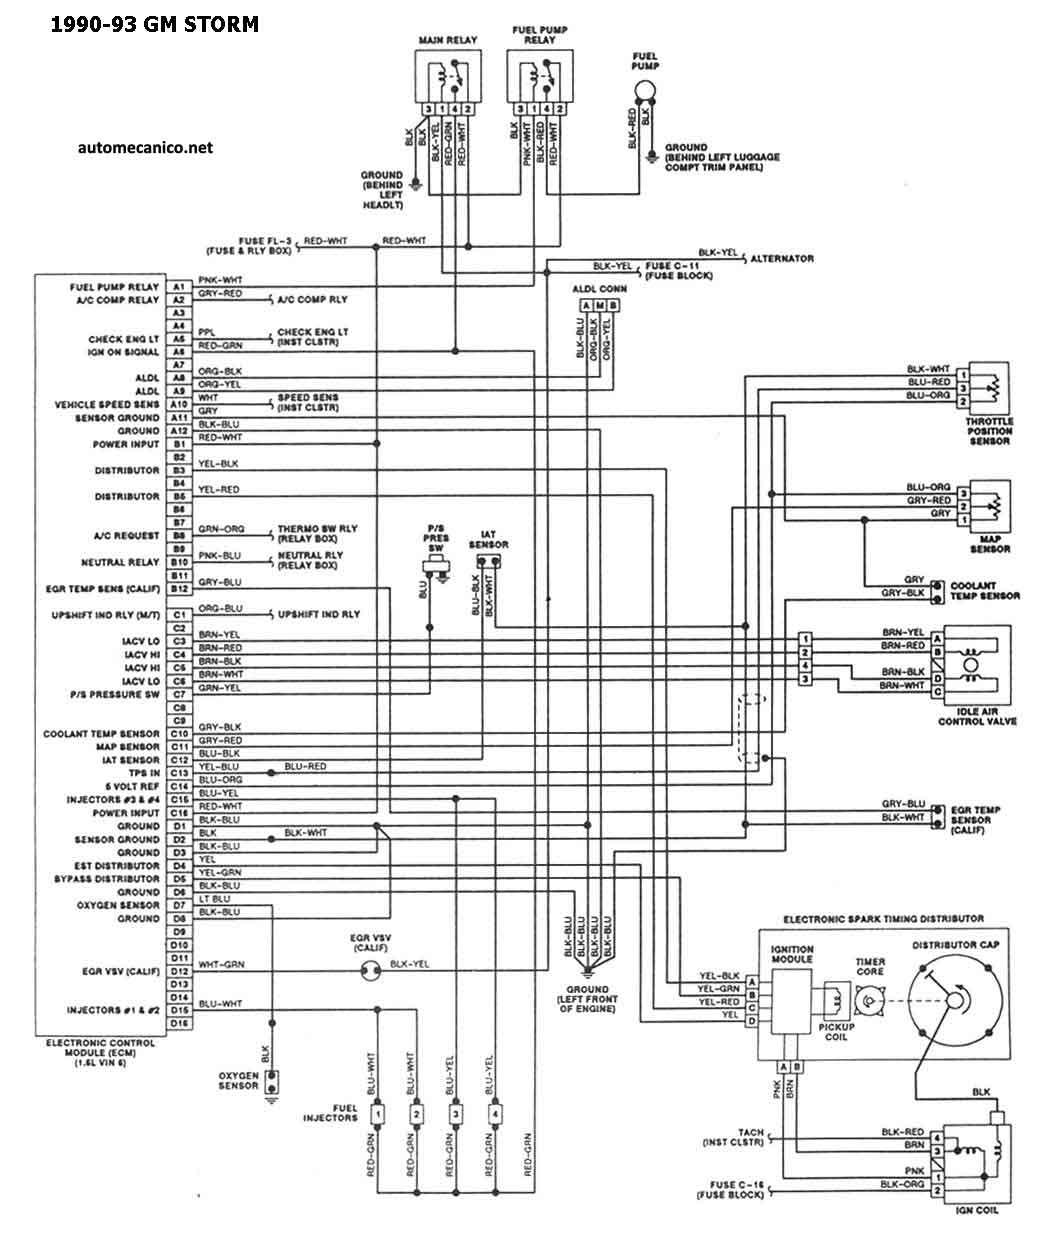 esqgm023 Iac Valve Diagram For Wiring on